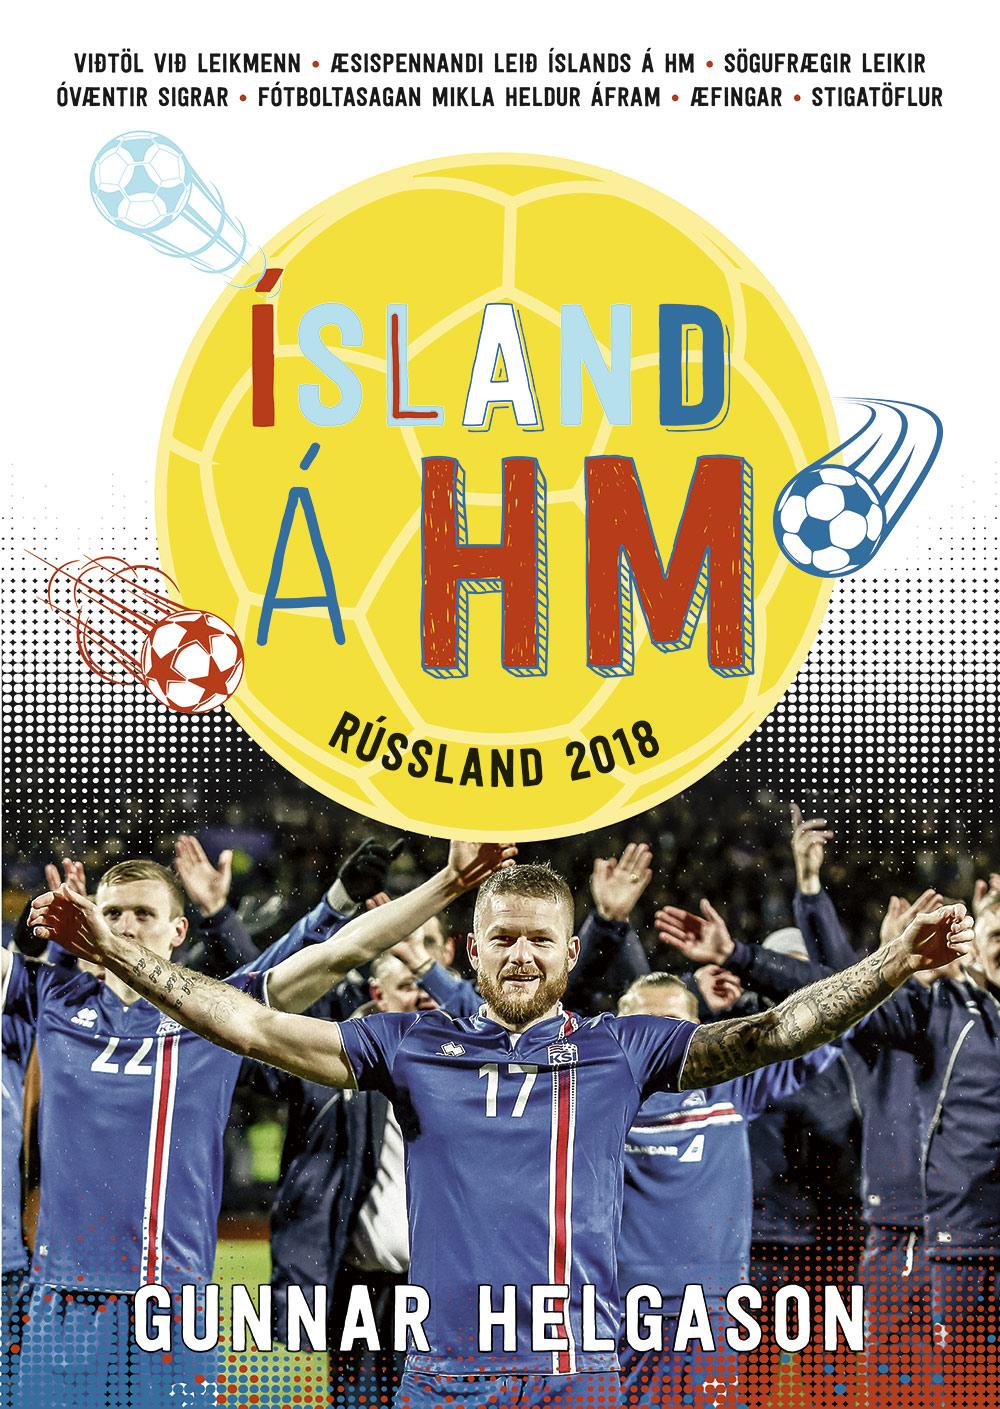 Ísland á HM – Rússland 2018